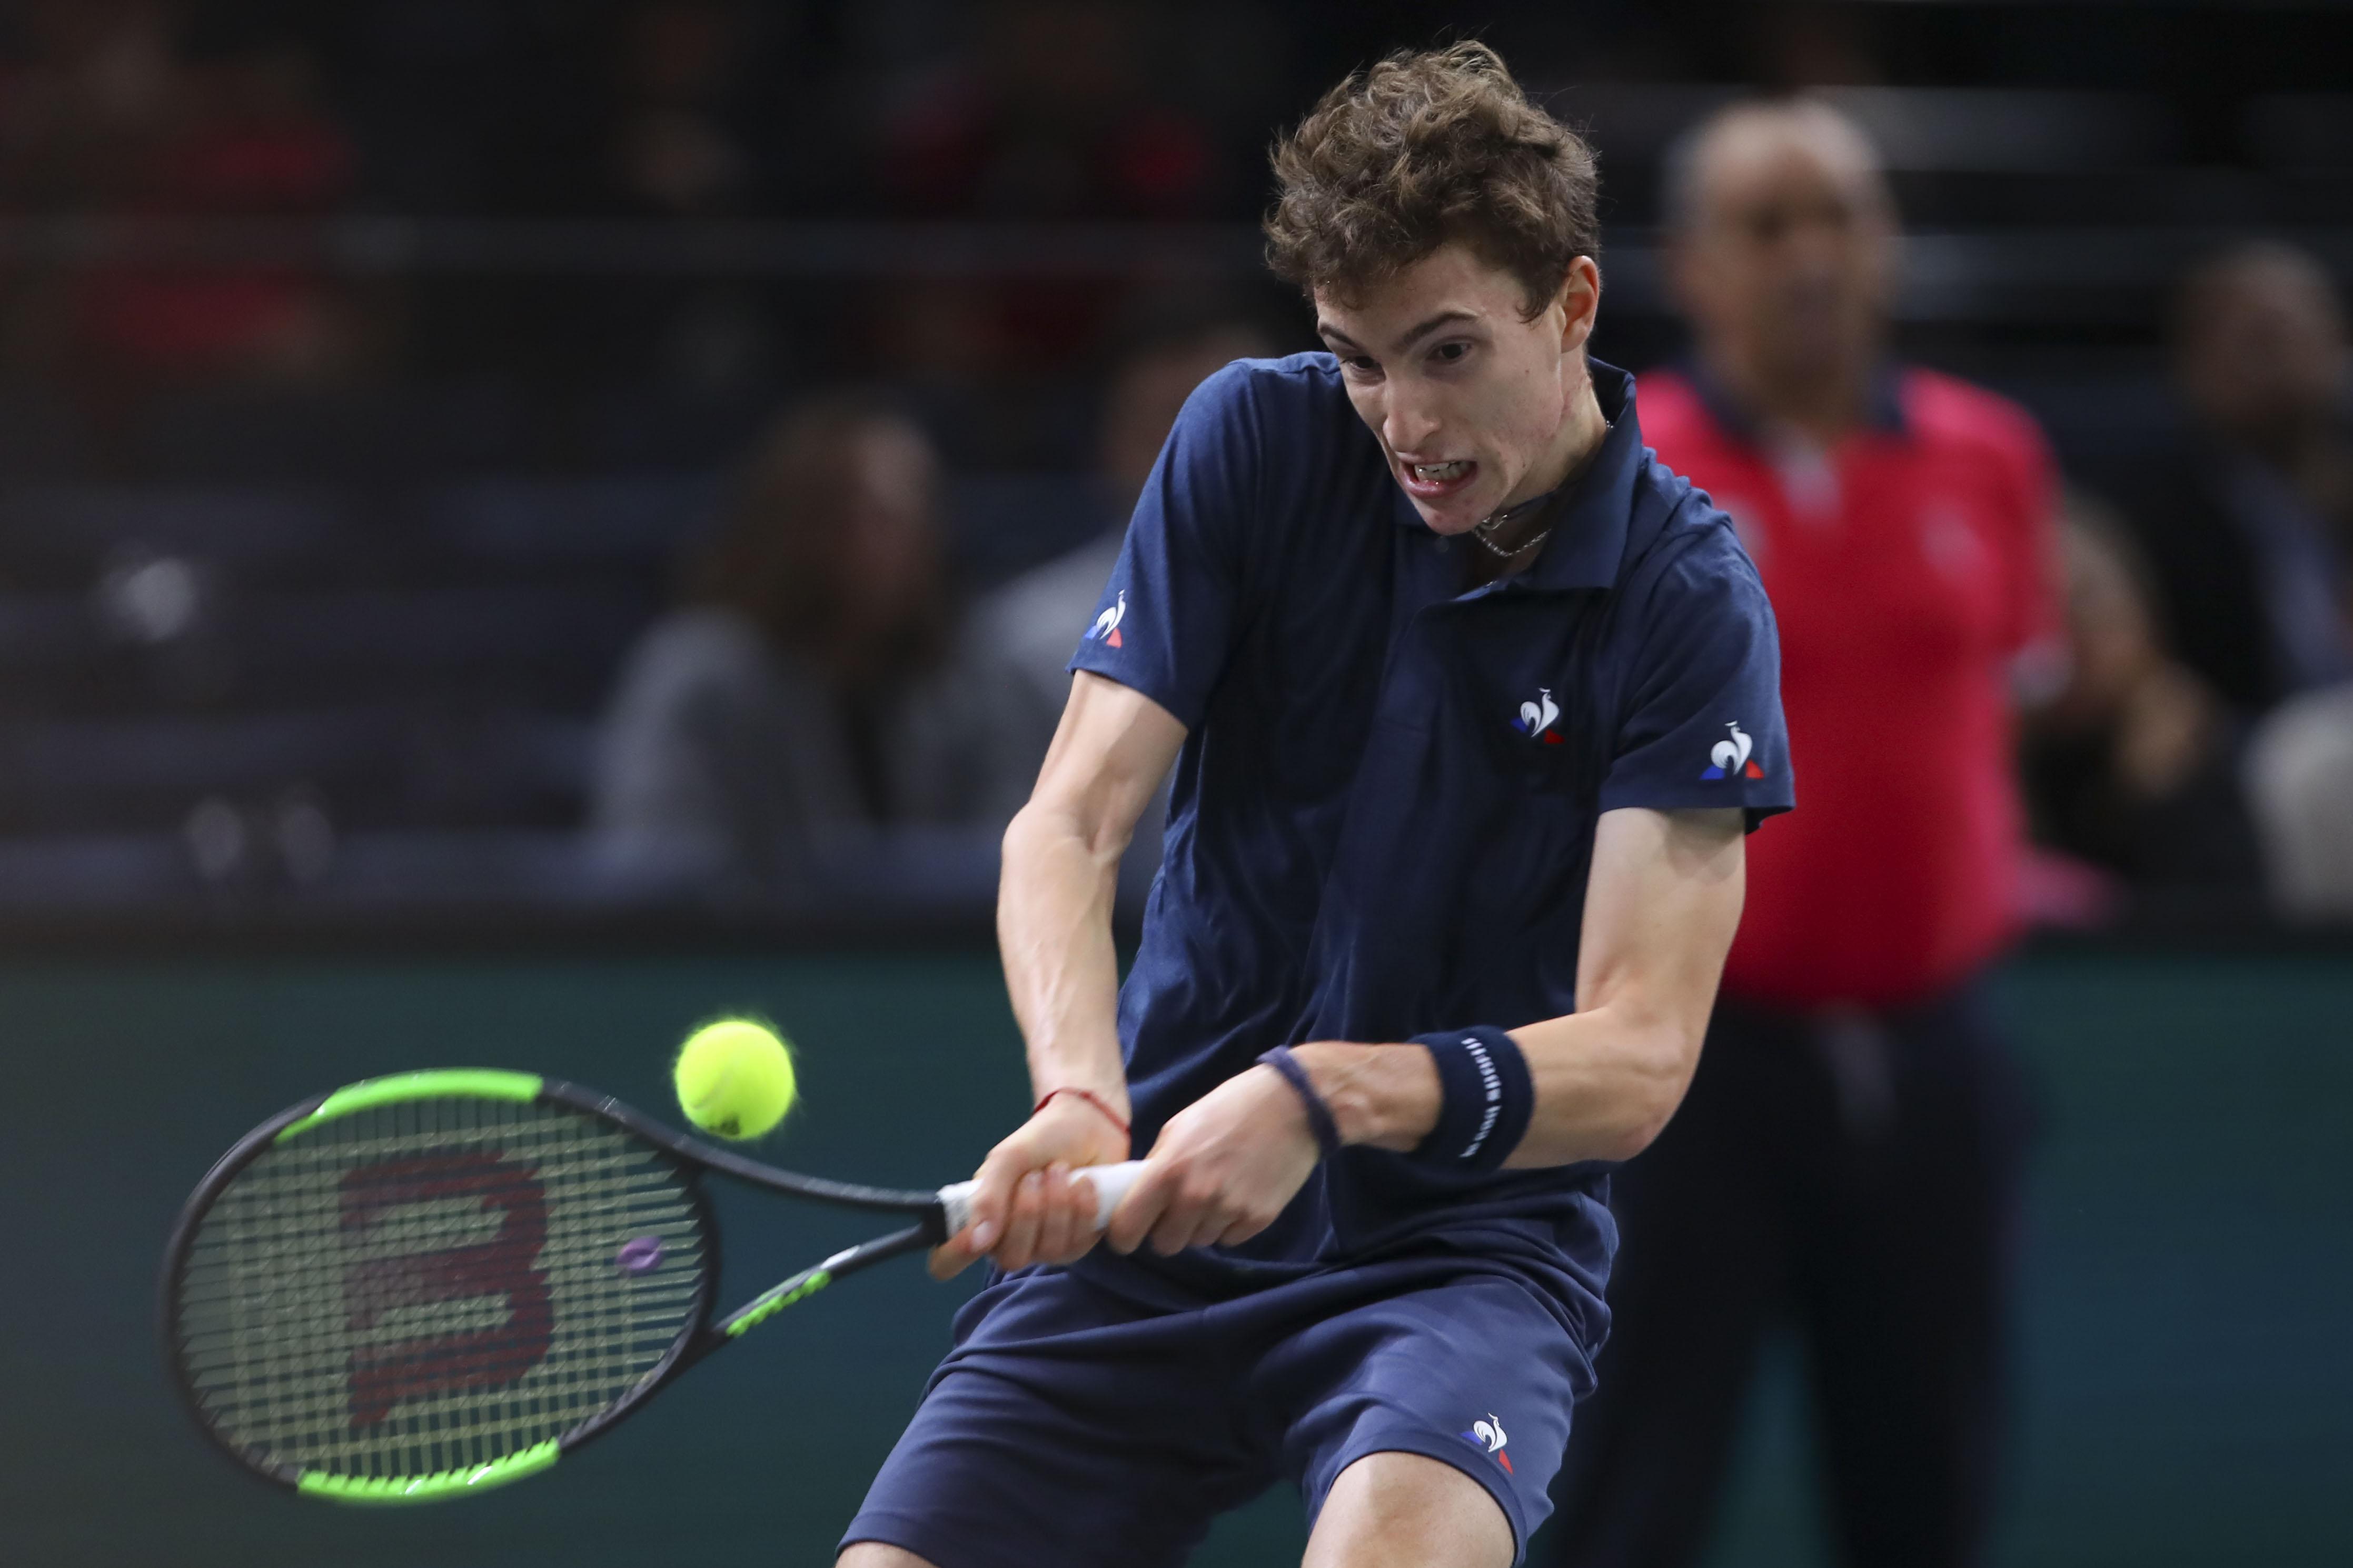 Tennis - ATP - Le jeune Ugo Humbert frappe fort à Marseille